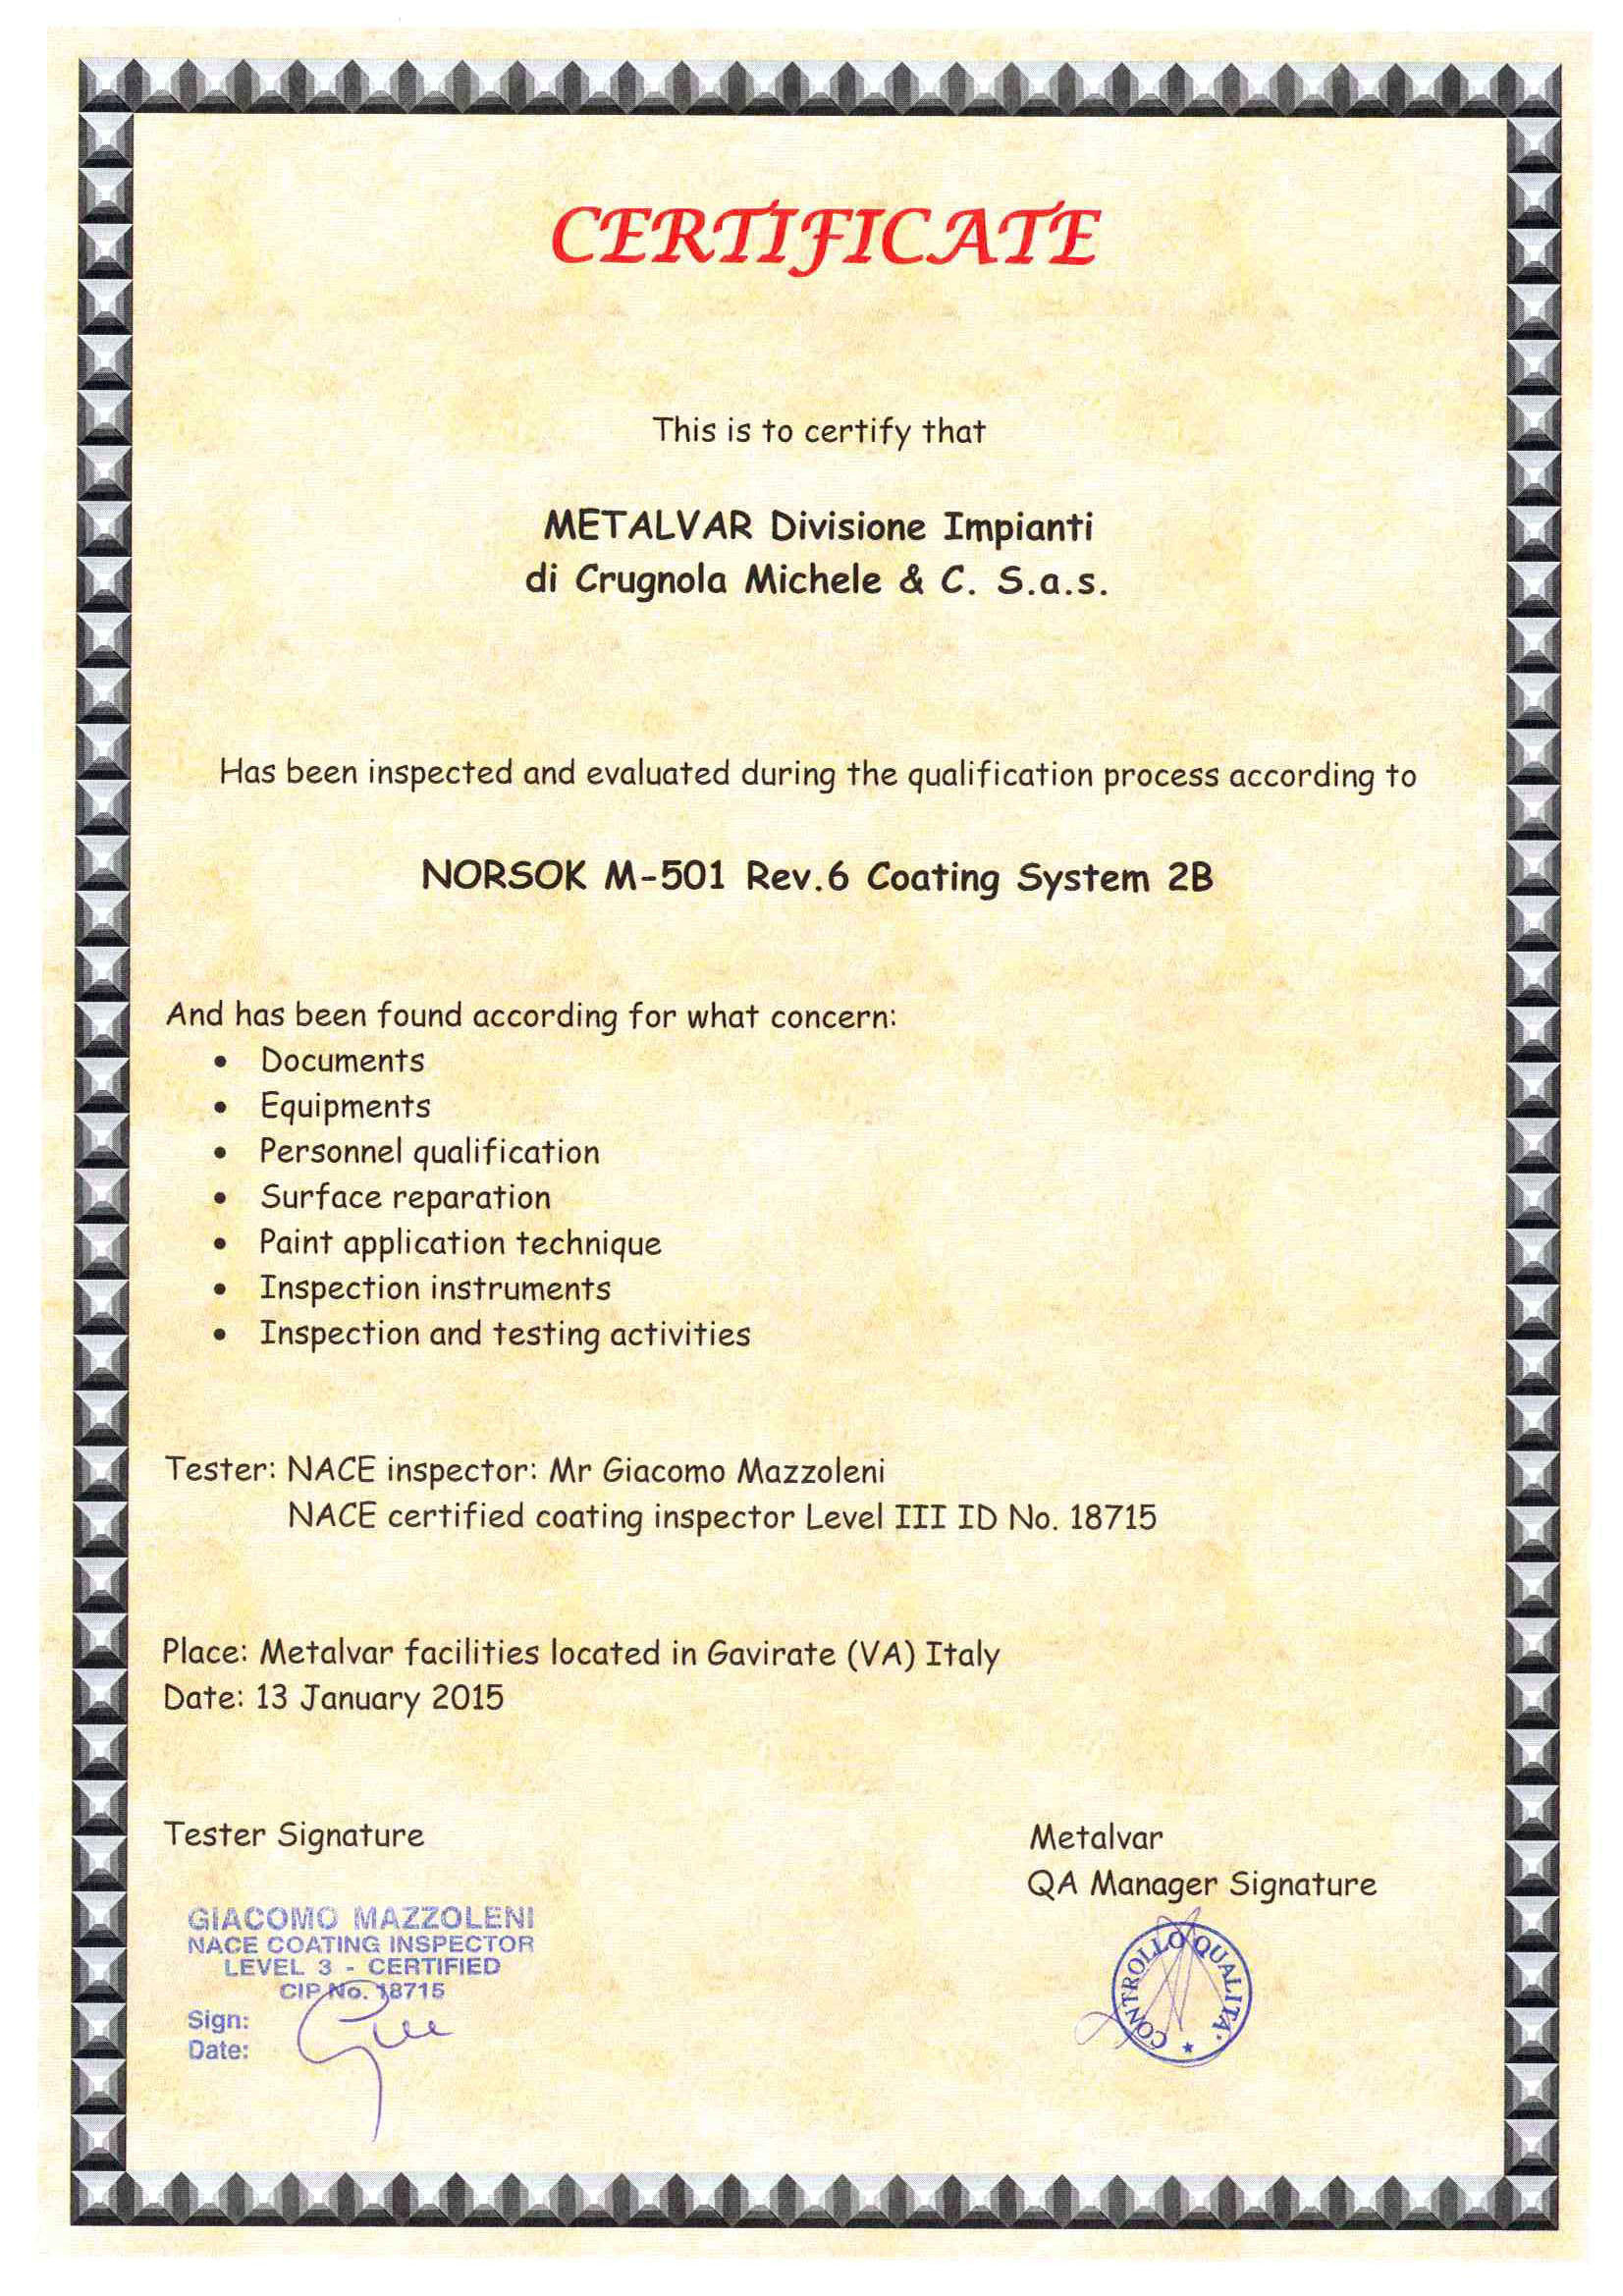 NORSOK M-501 rev 6 Coating System 2B